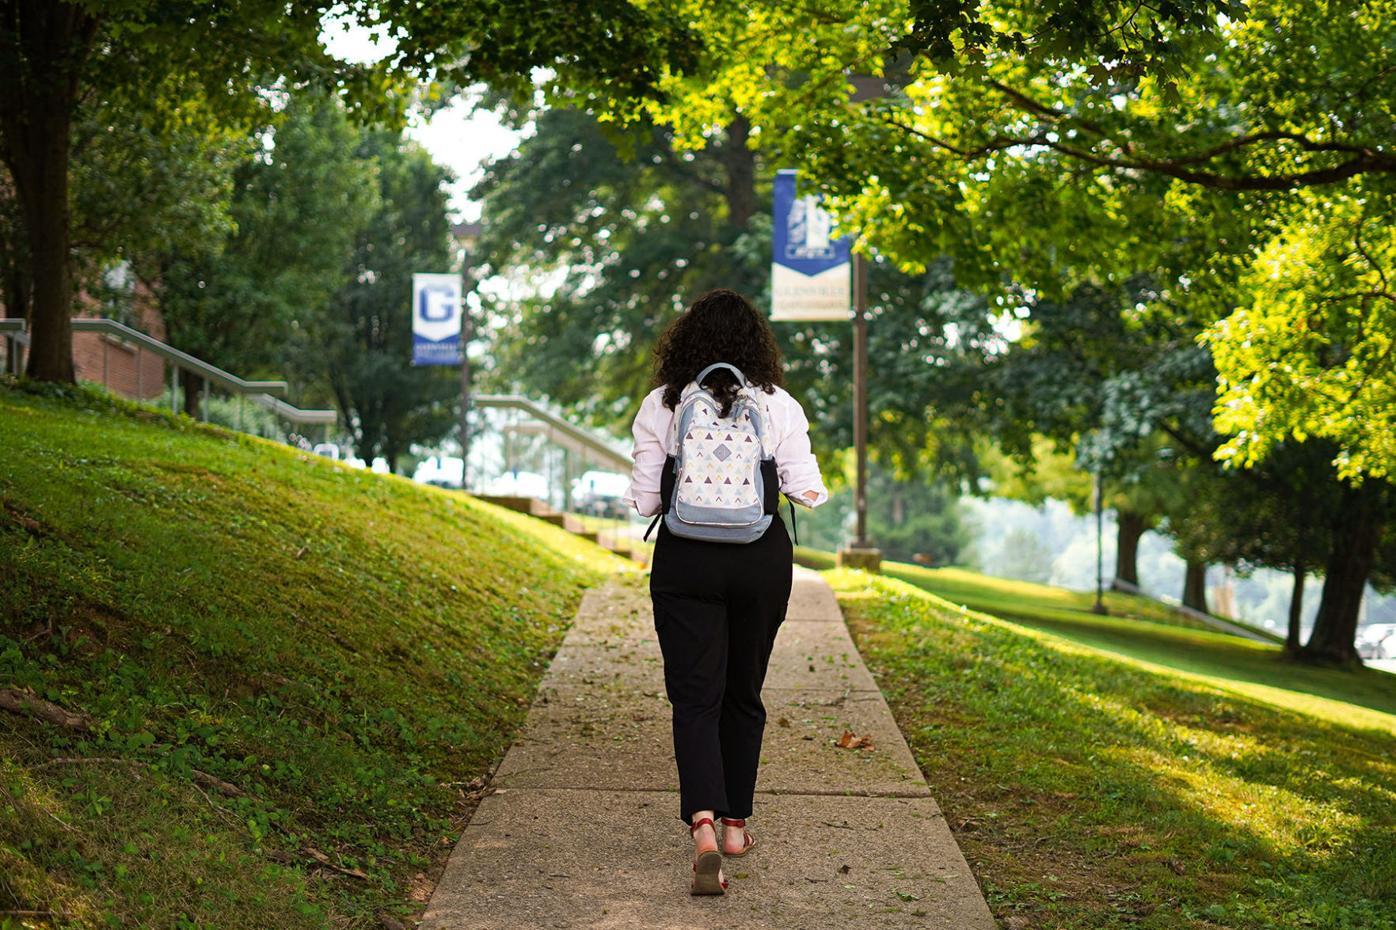 Glenville State College return